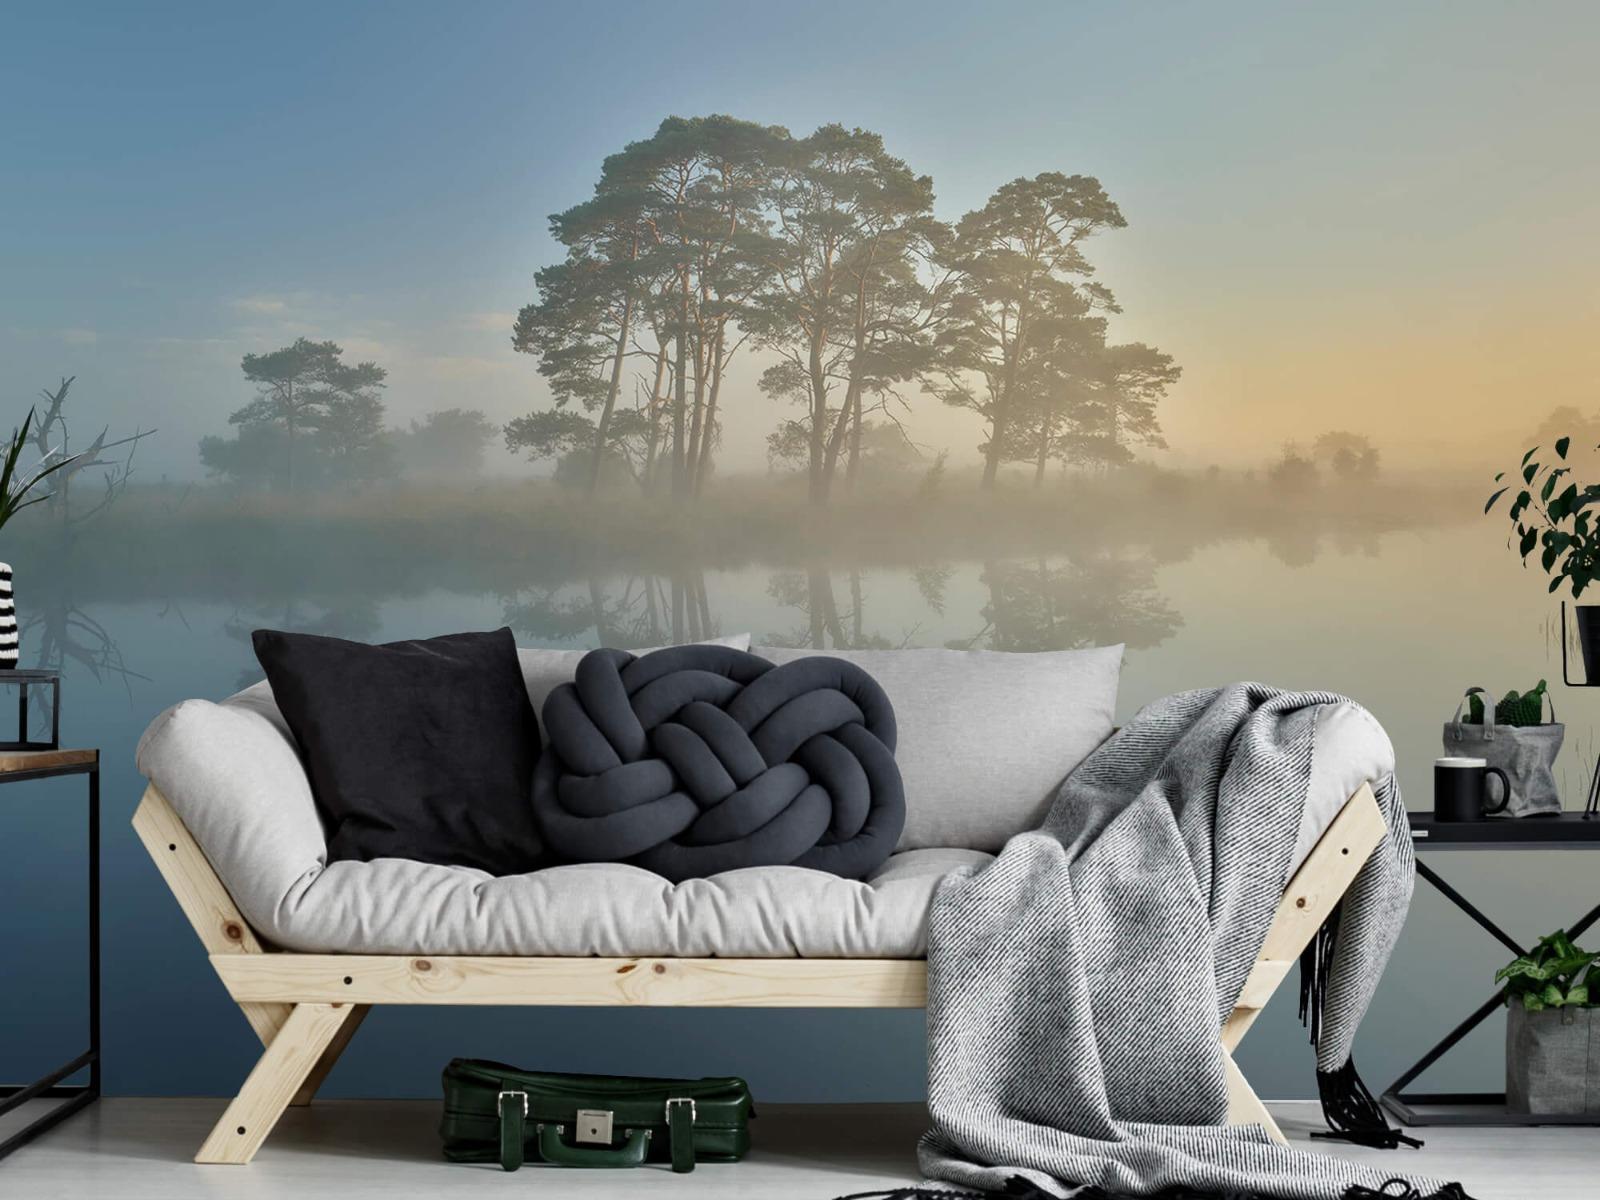 Natuur - Mist in heidegebied 1